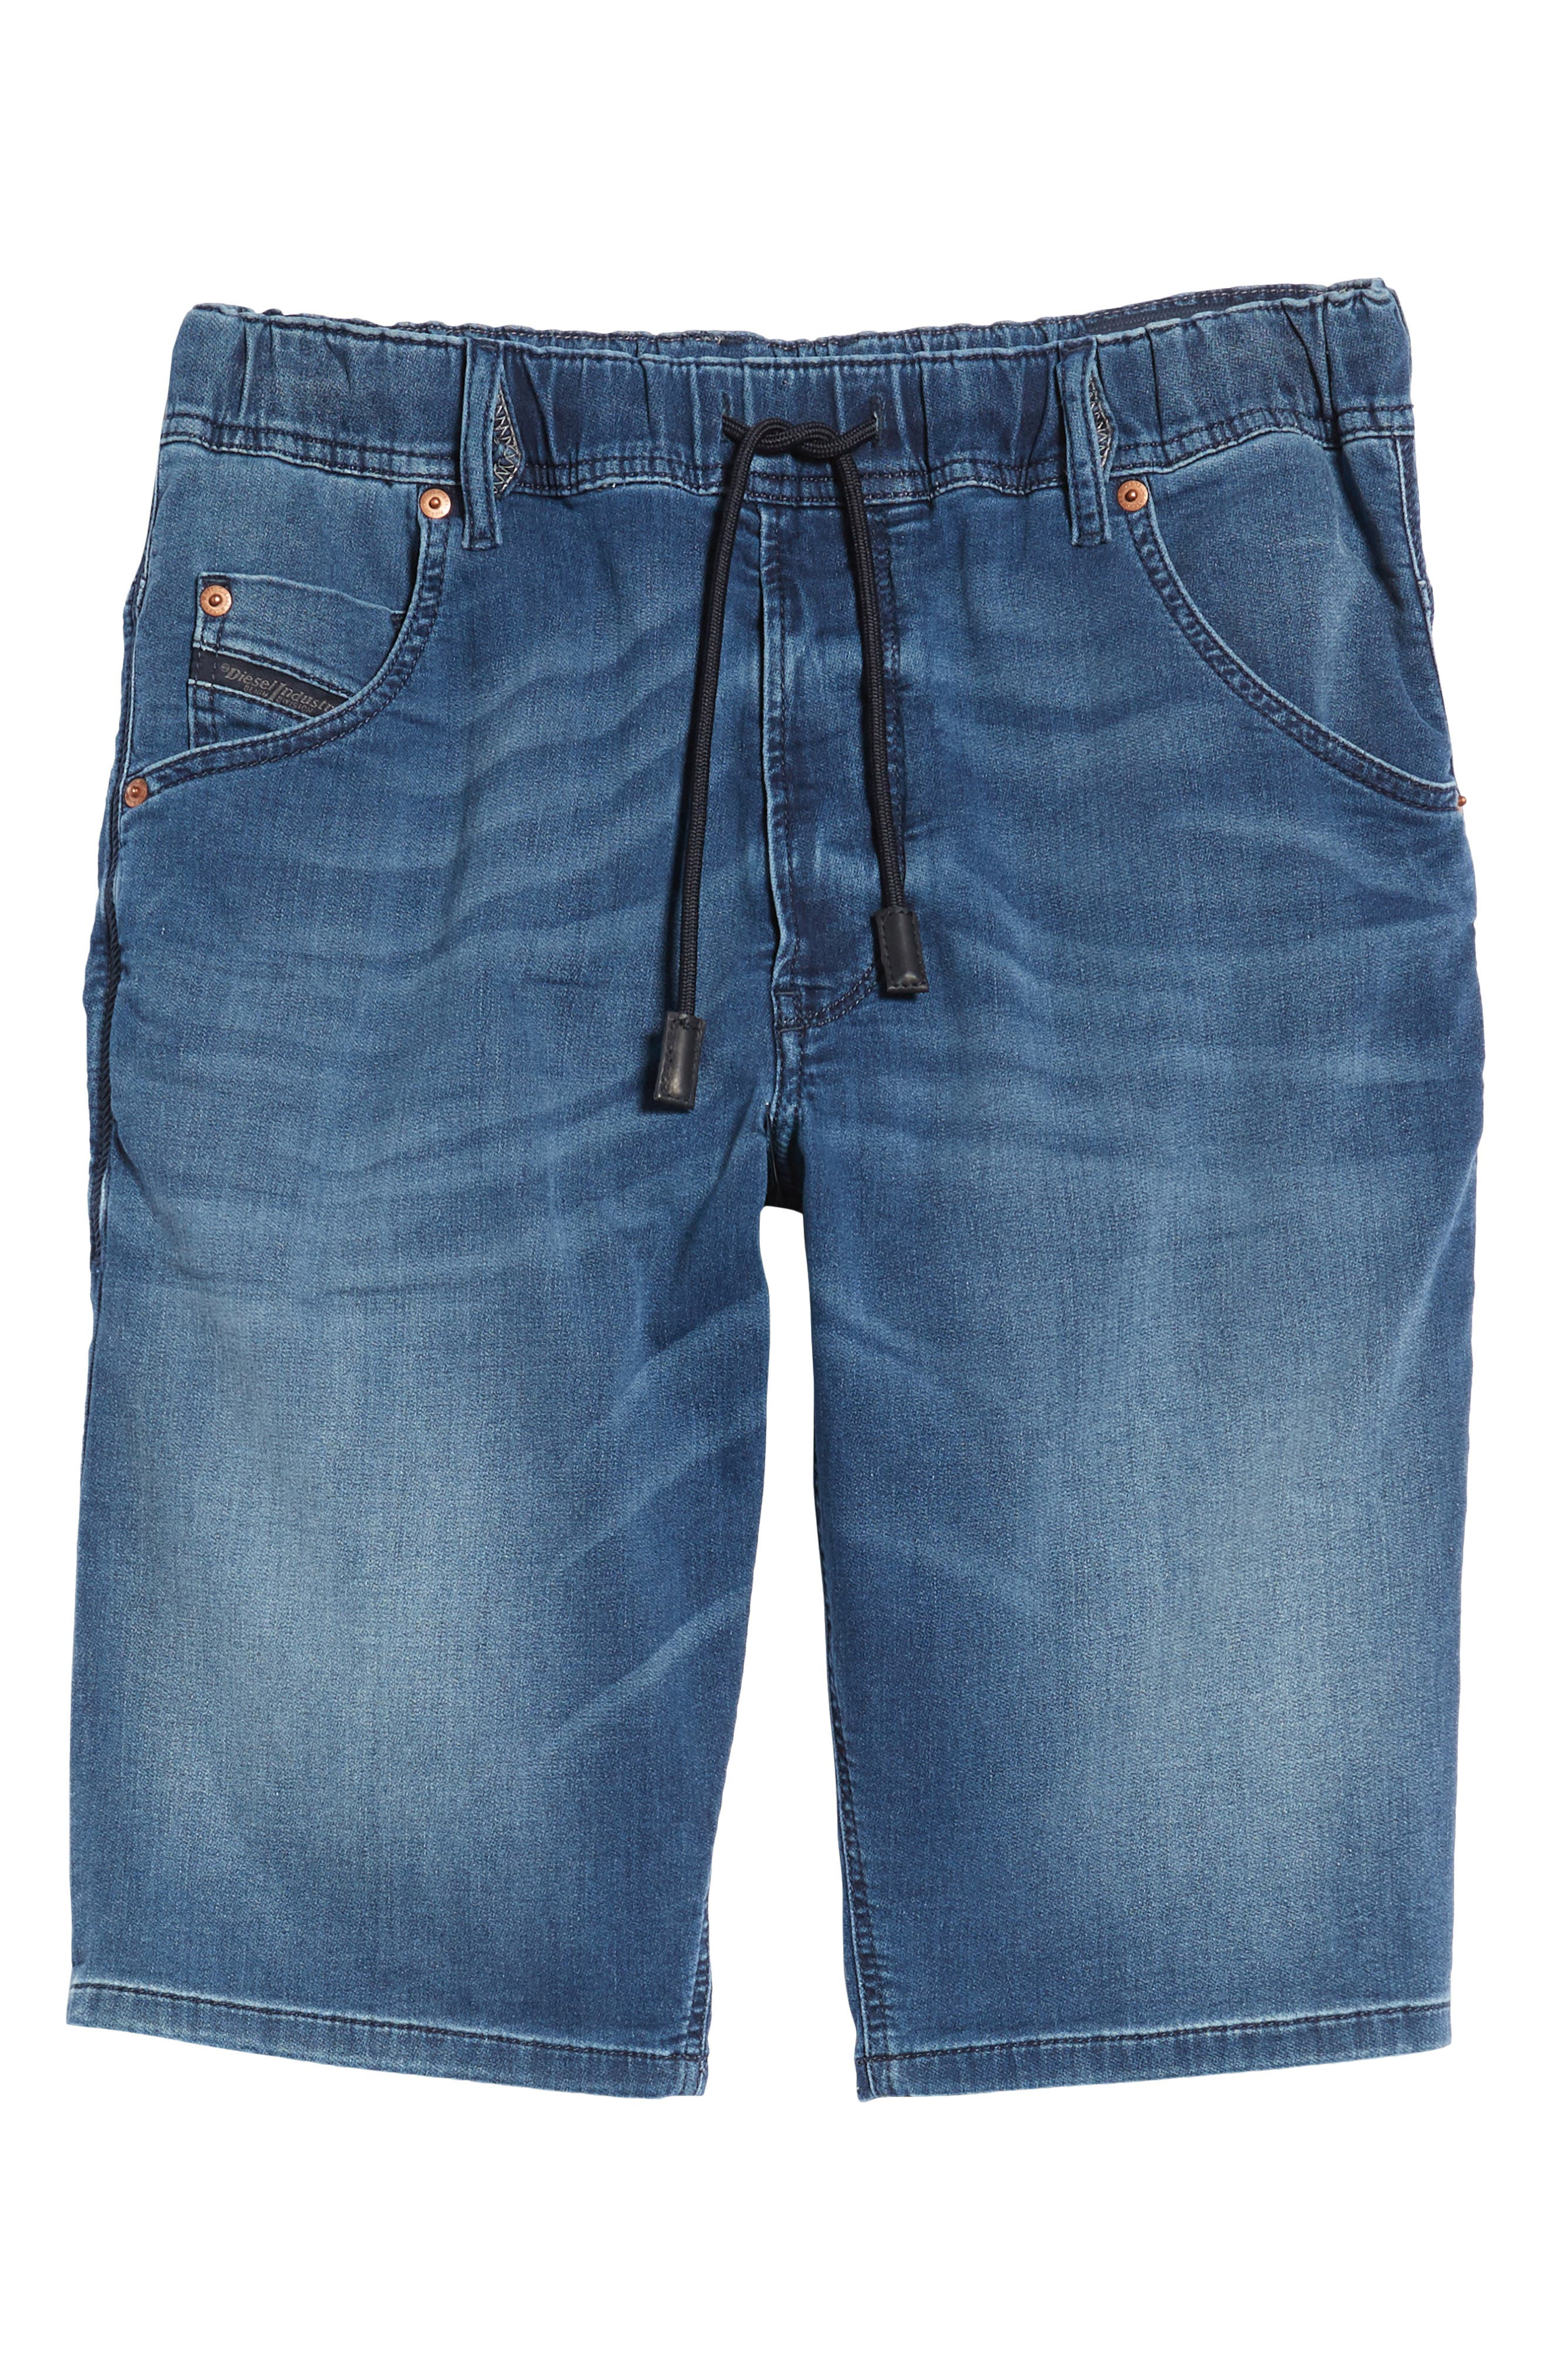 Krooshort Denim Shorts,                             Alternate thumbnail 6, color,                             0687C